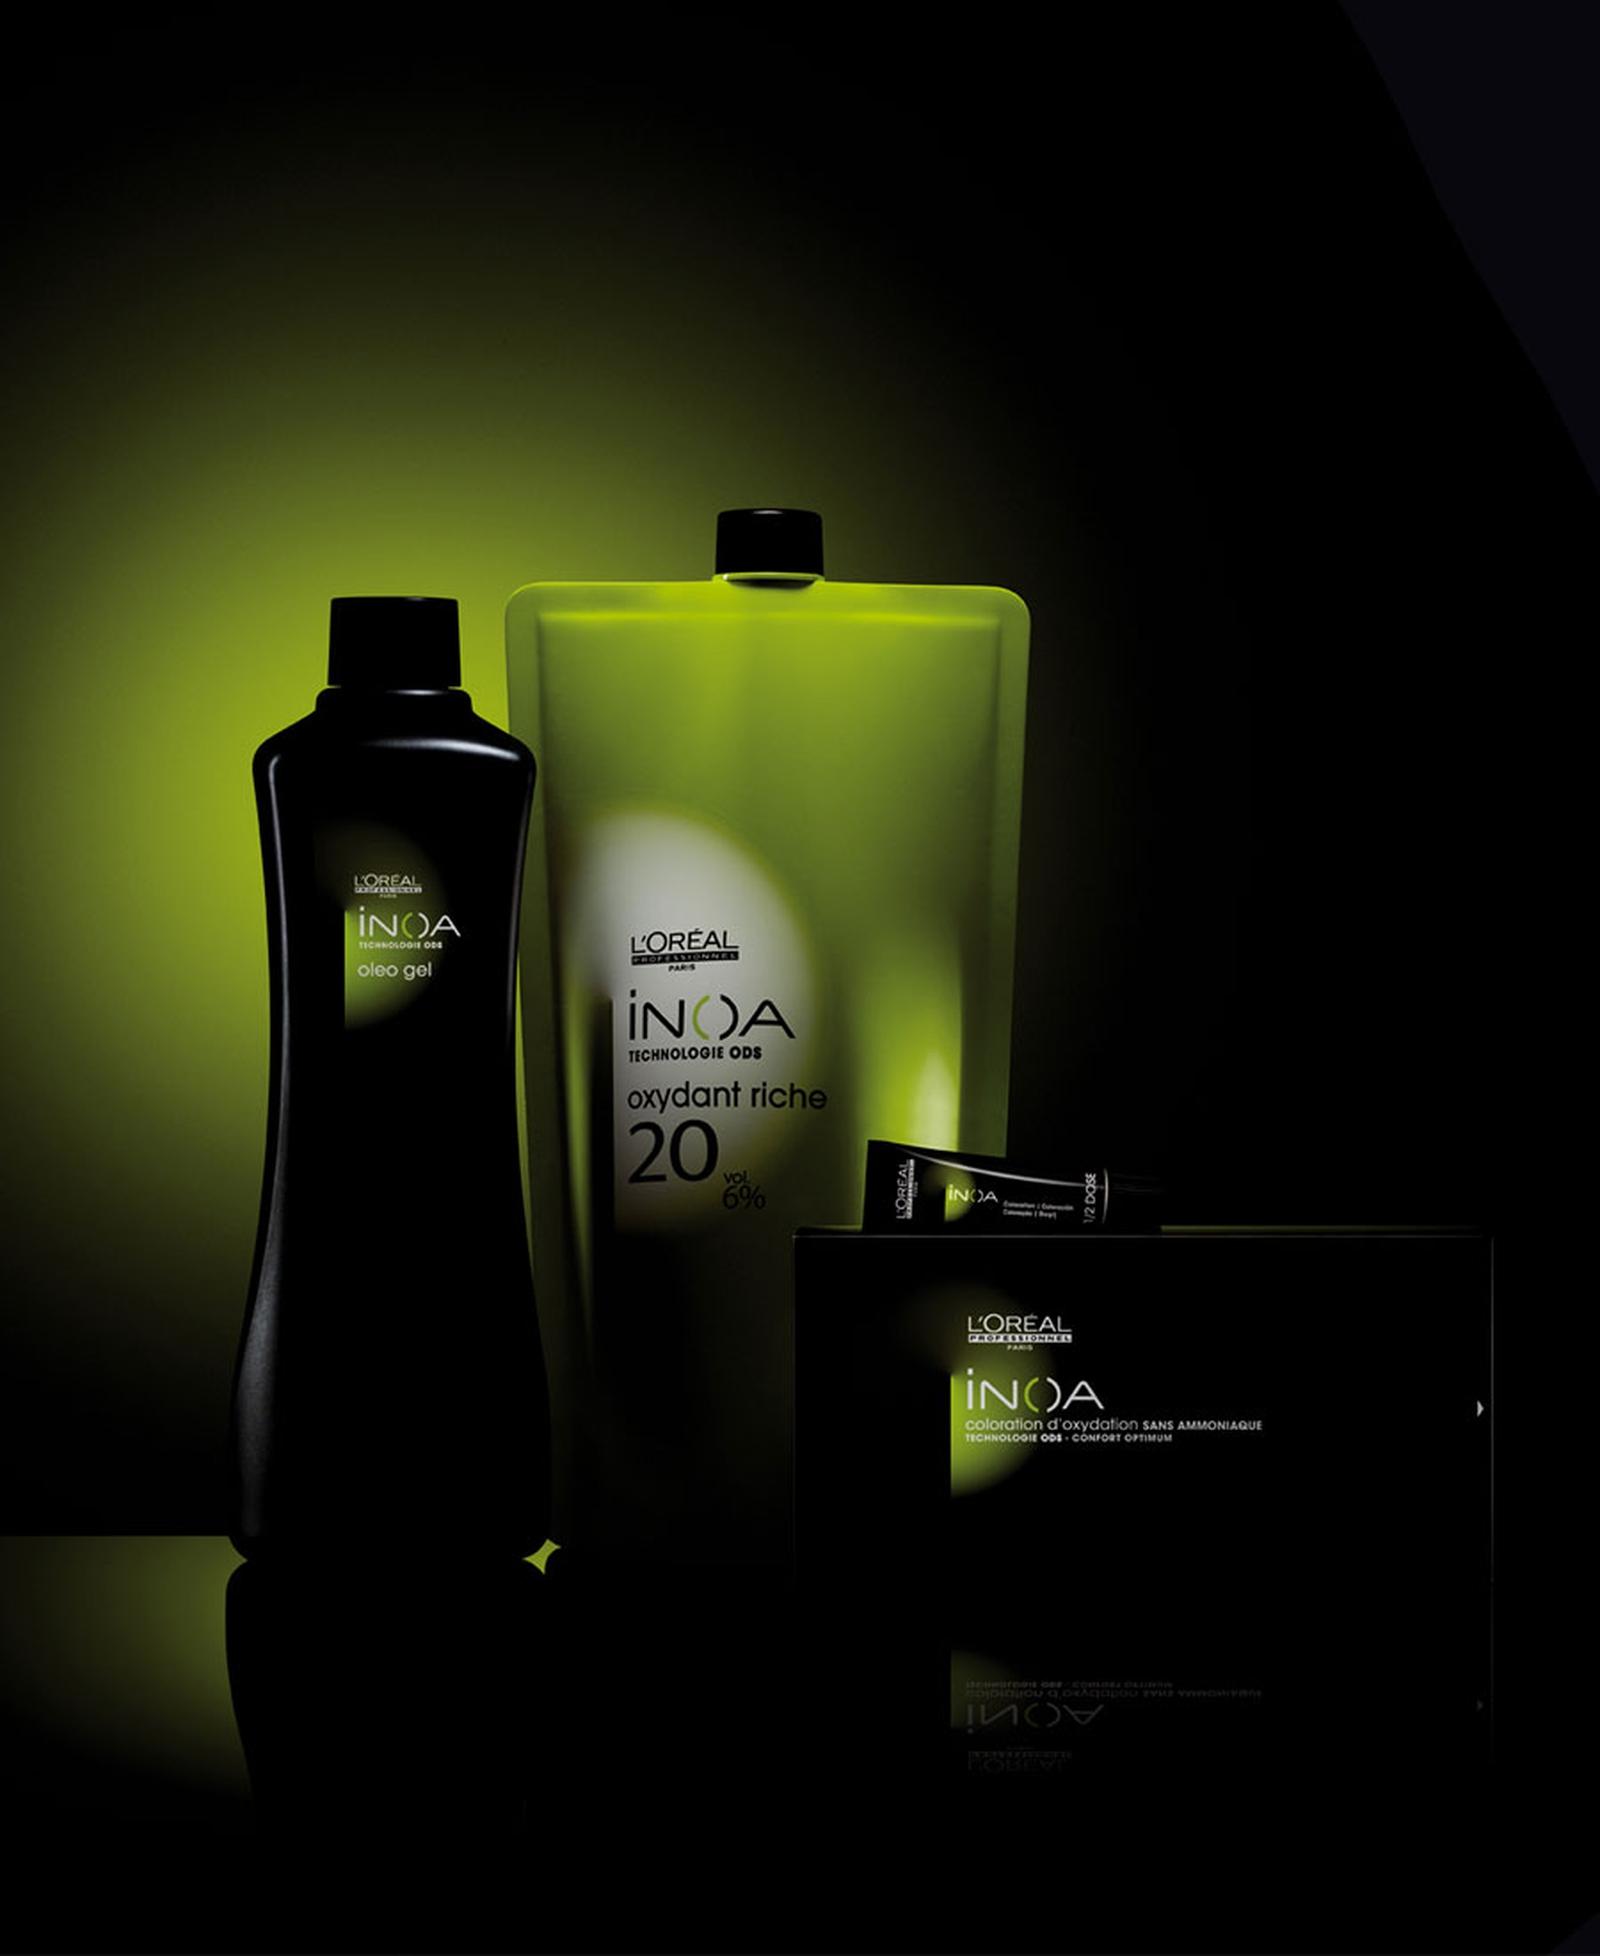 L'Oréal INOA Hair Colouring System